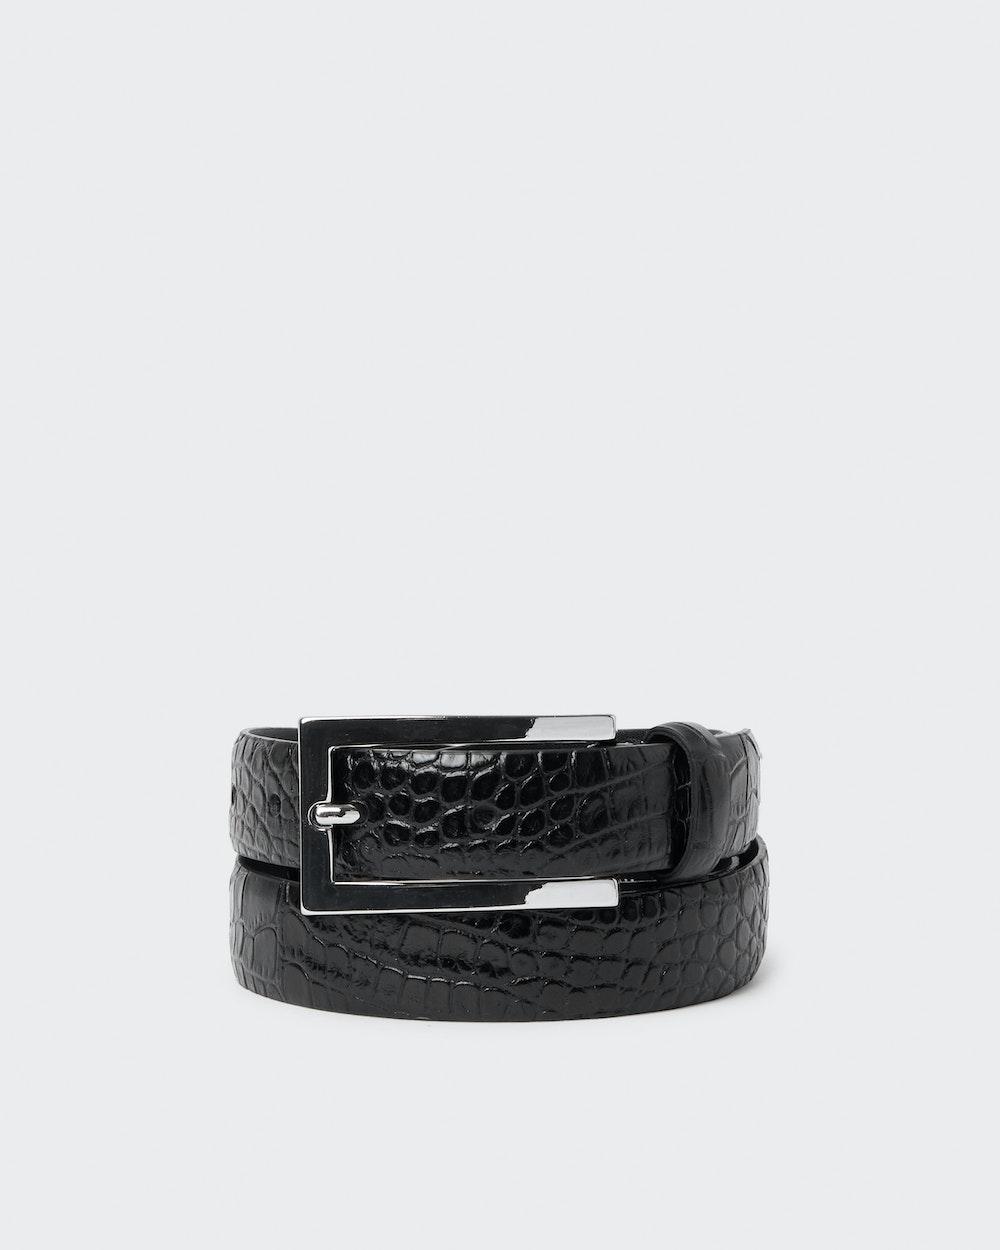 Persson bälte Black Saddler